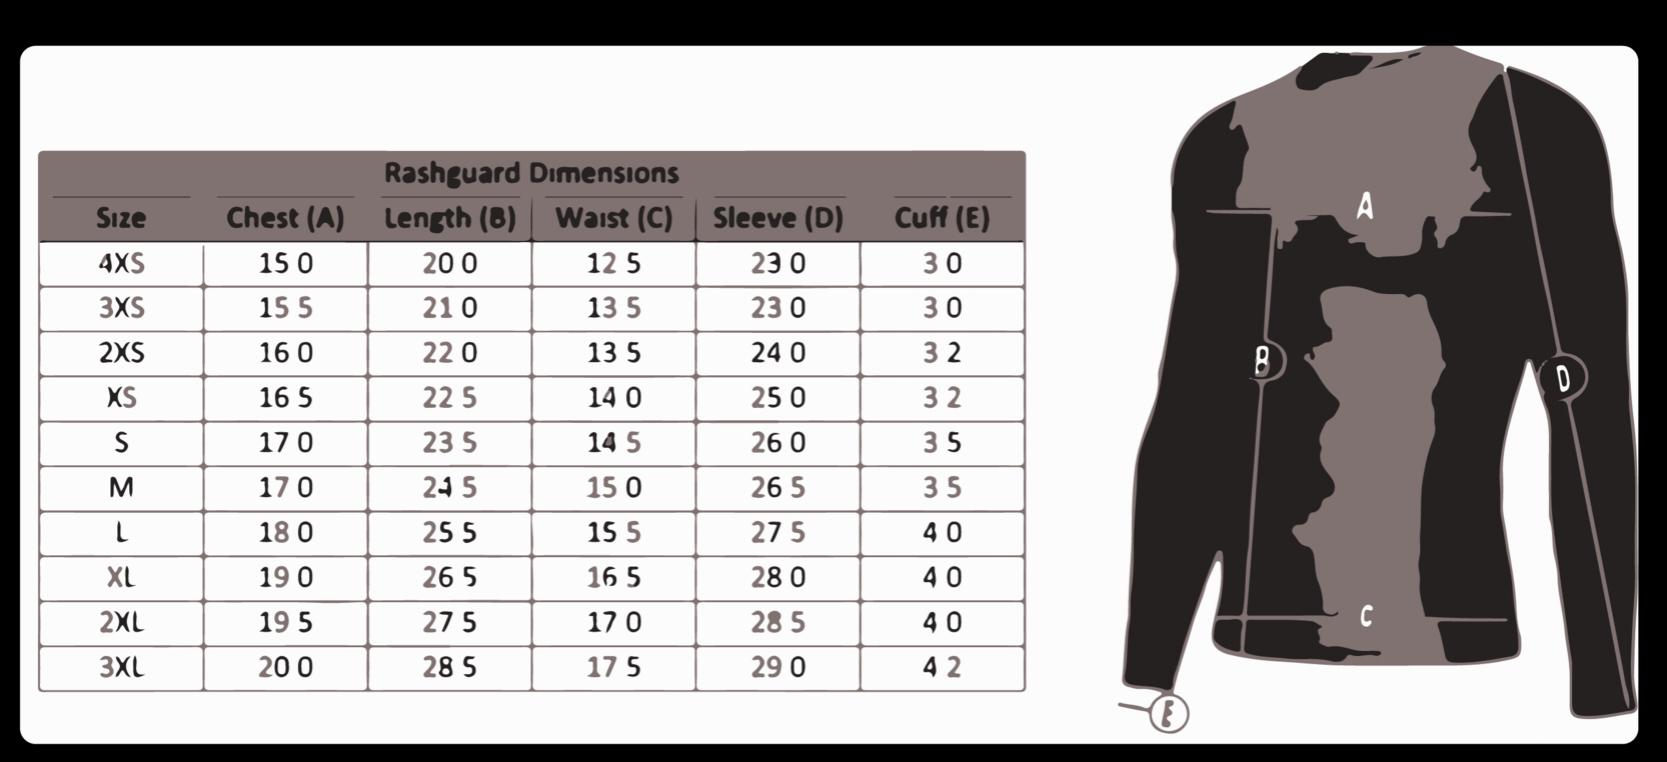 Size chart for custom rashguards